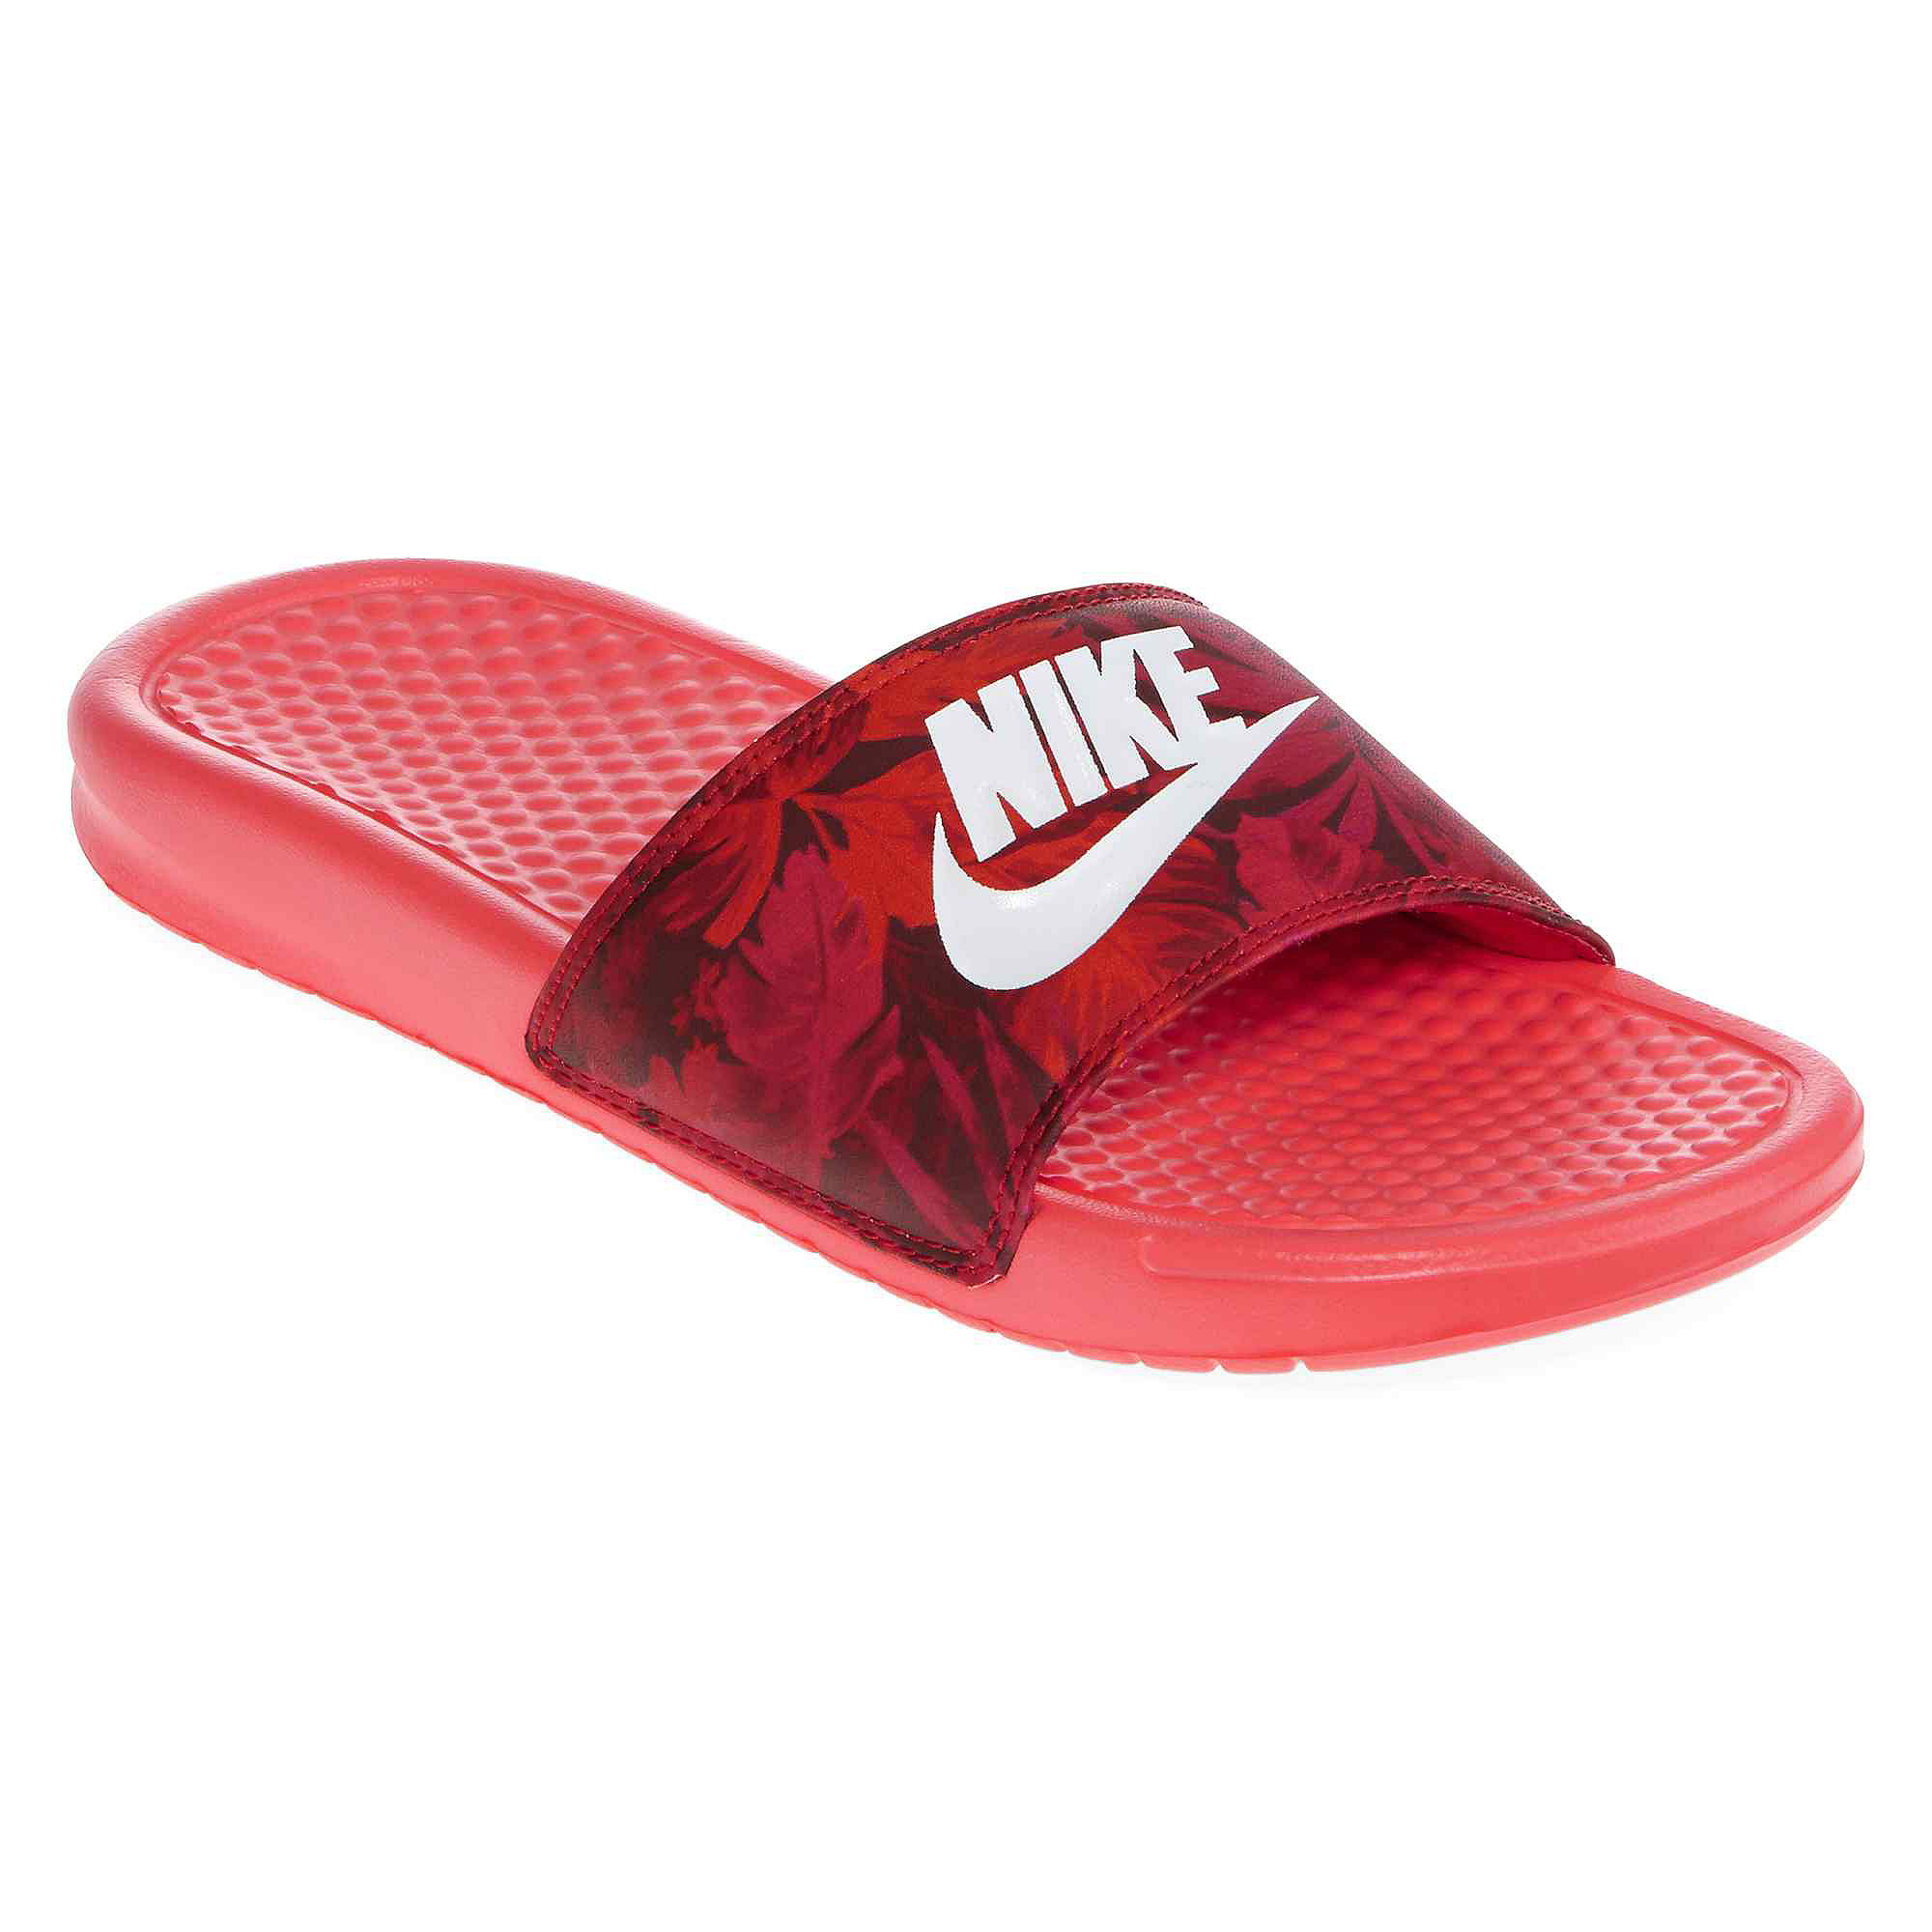 83bf7acc0 ... UPC 826216401512 product image for Nike Benassi JDI Slide Sandals